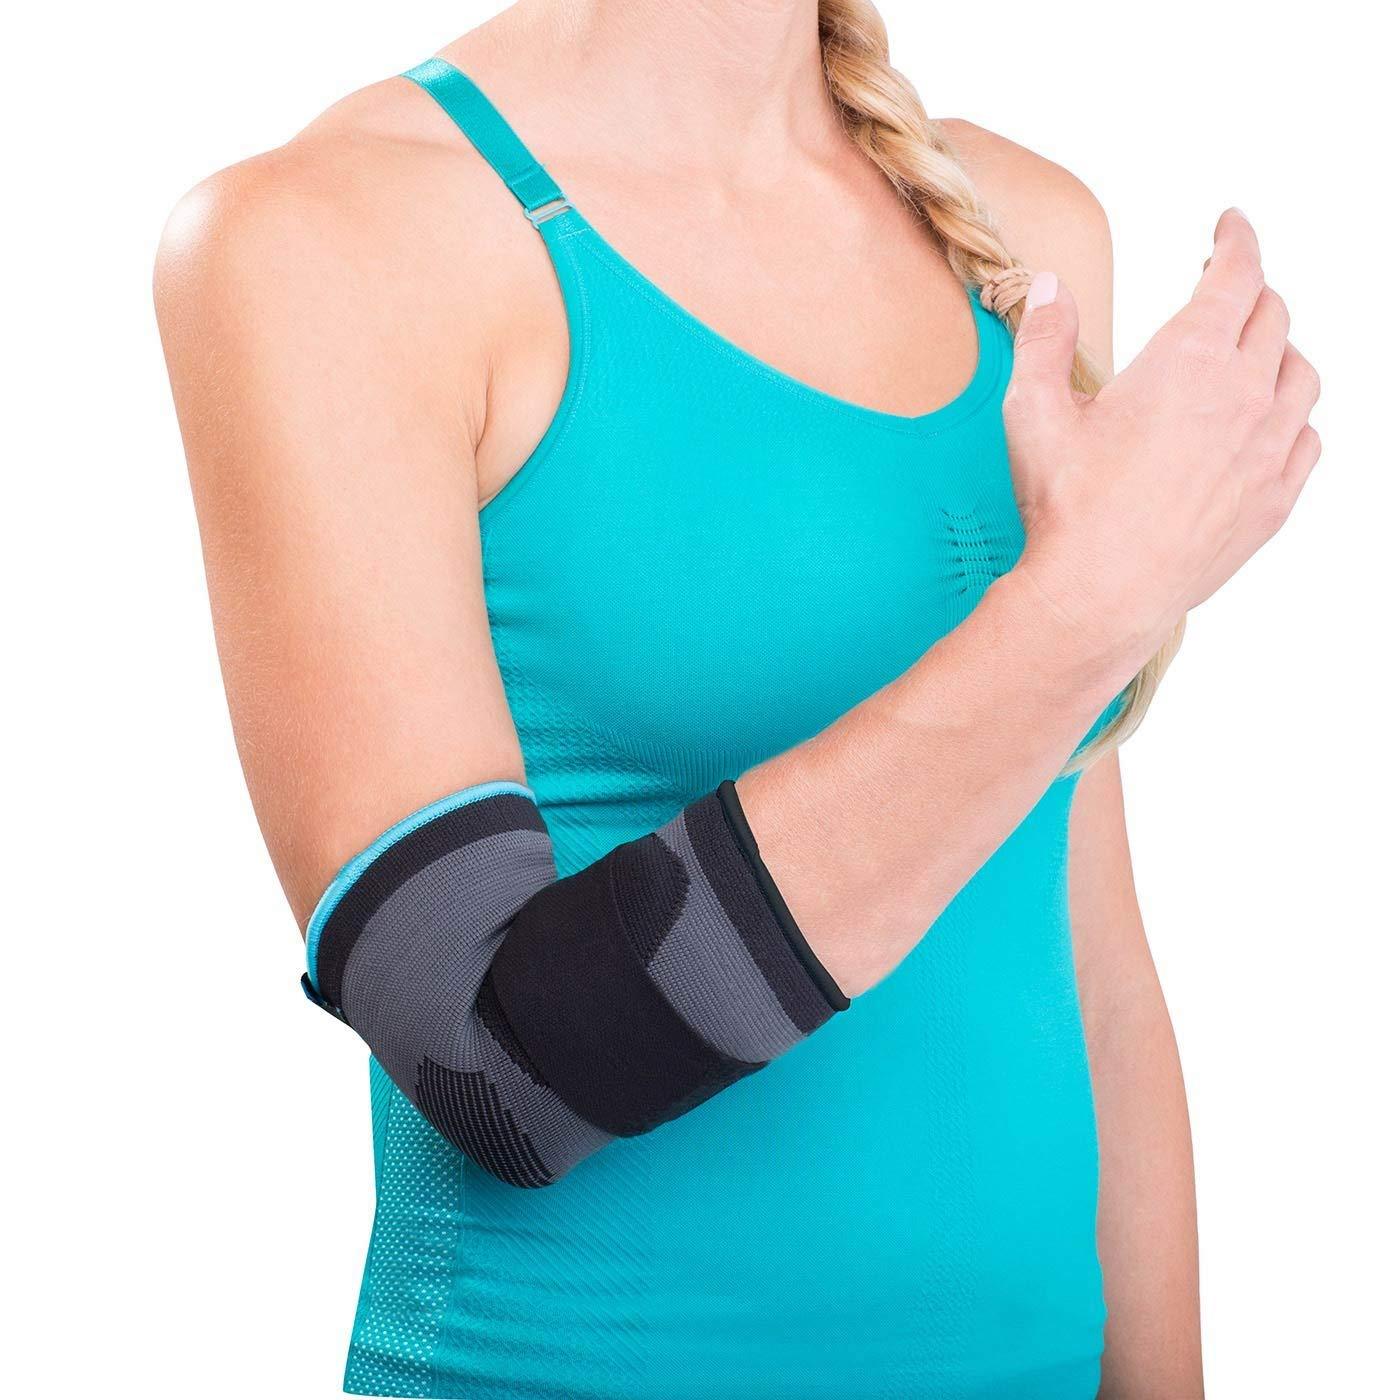 a58be01ebf Get Quotations · DonJoy Advantage DA161ES02-BLK-M Deluxe Elastic Elbow for  Sprains, Strains, Golfer's